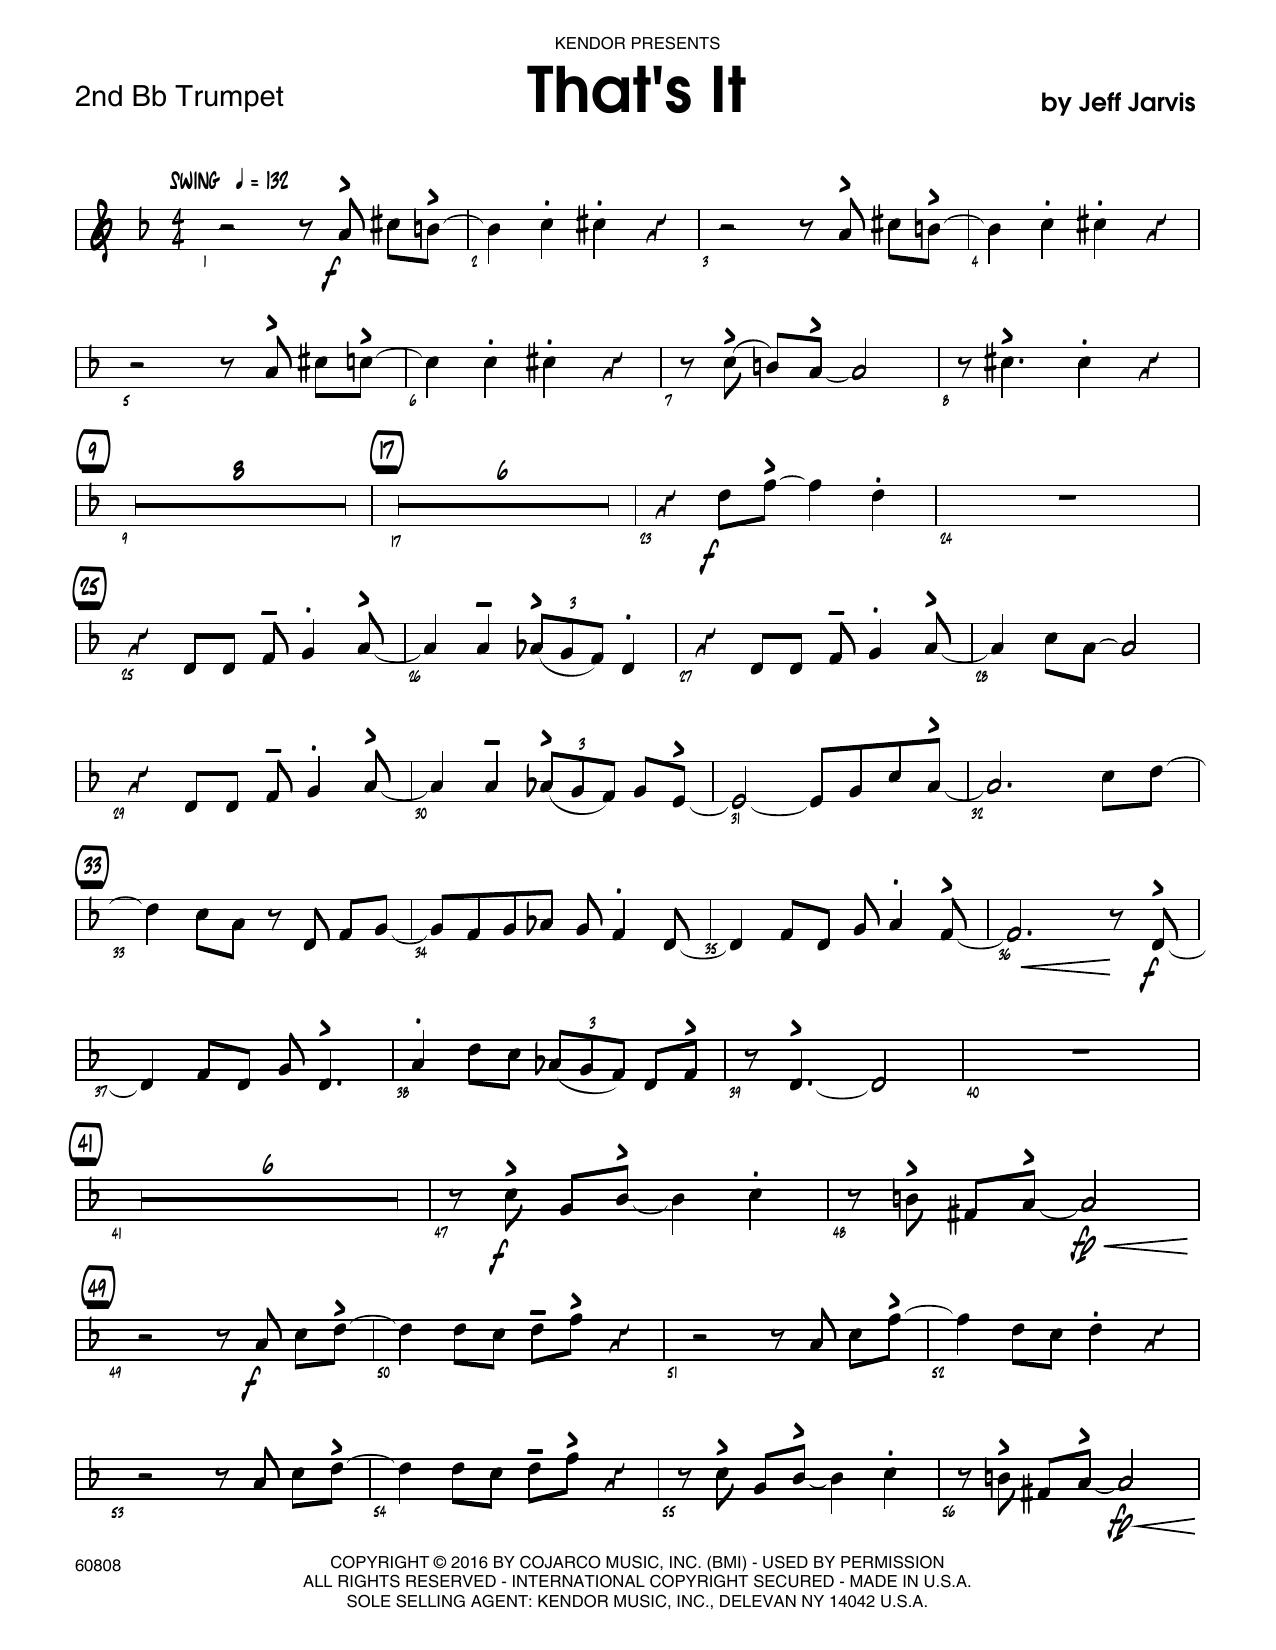 That's It - 2nd Bb Trumpet Sheet Music